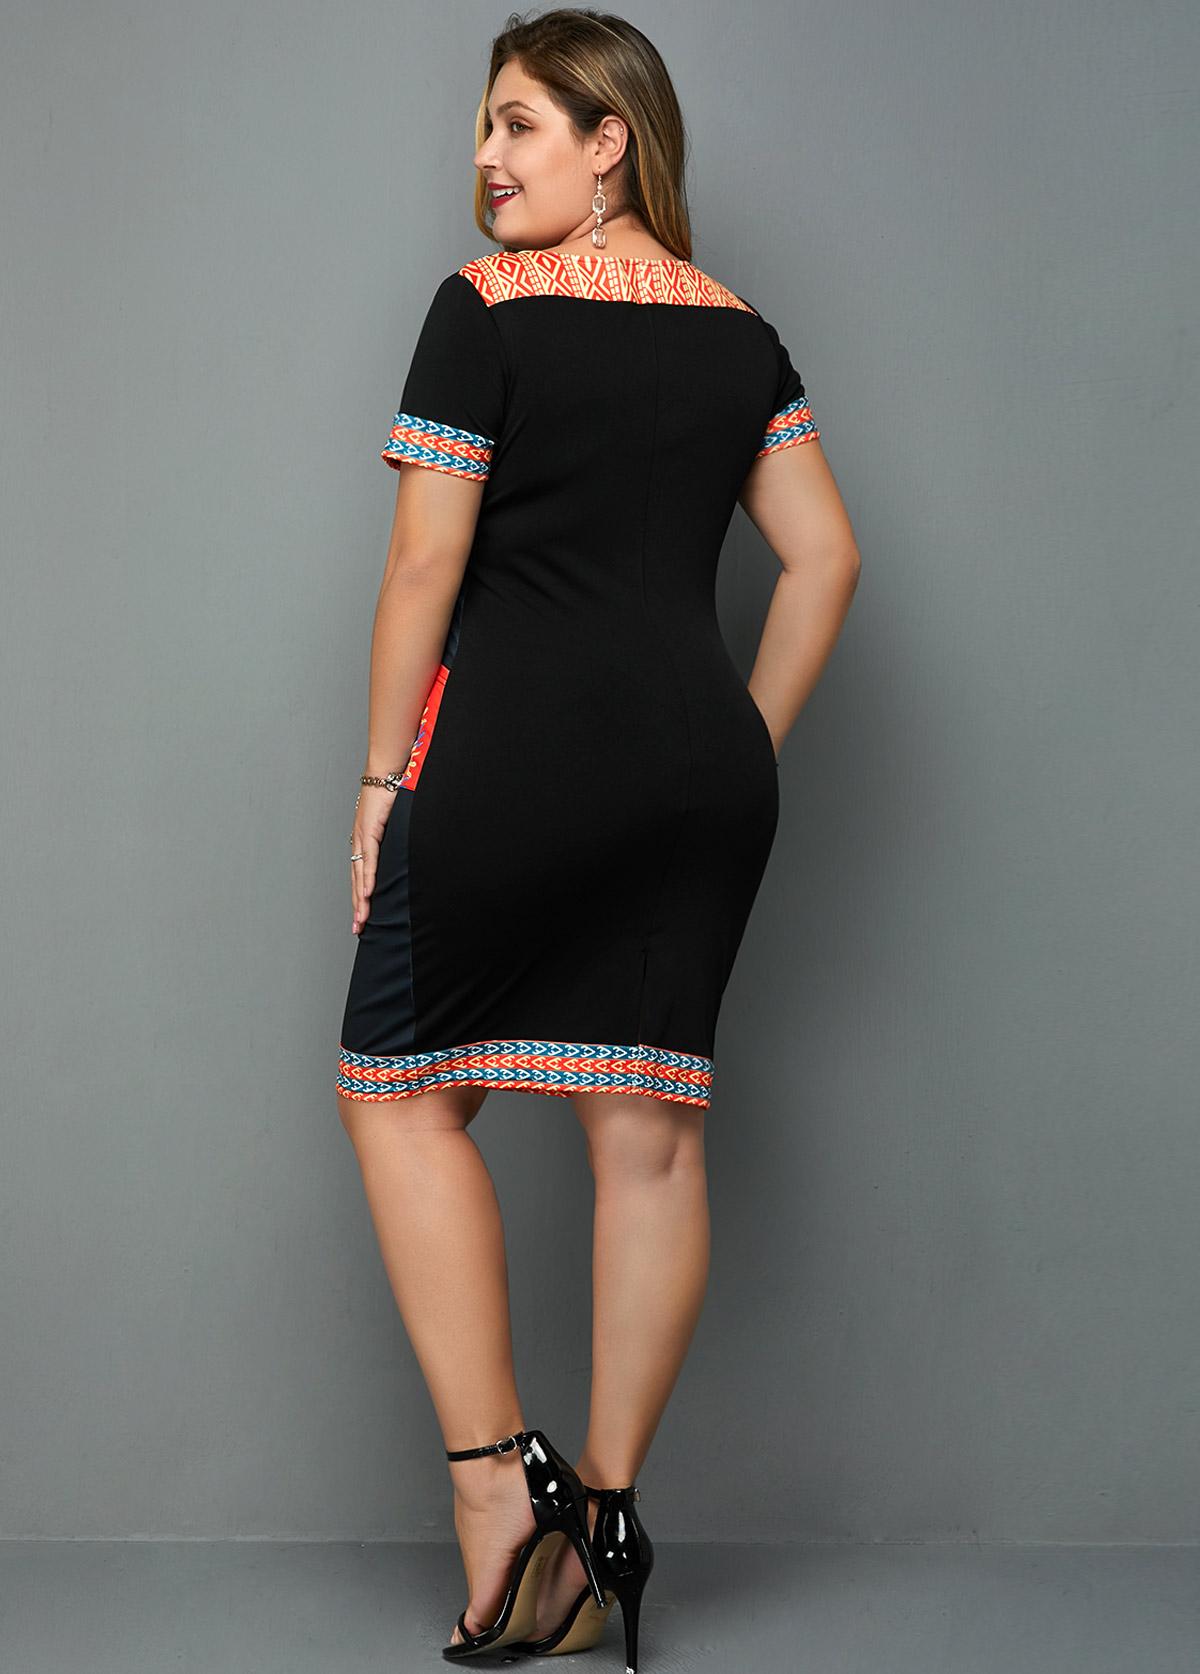 Tribal Print Short Sleeve Plus Size Dress